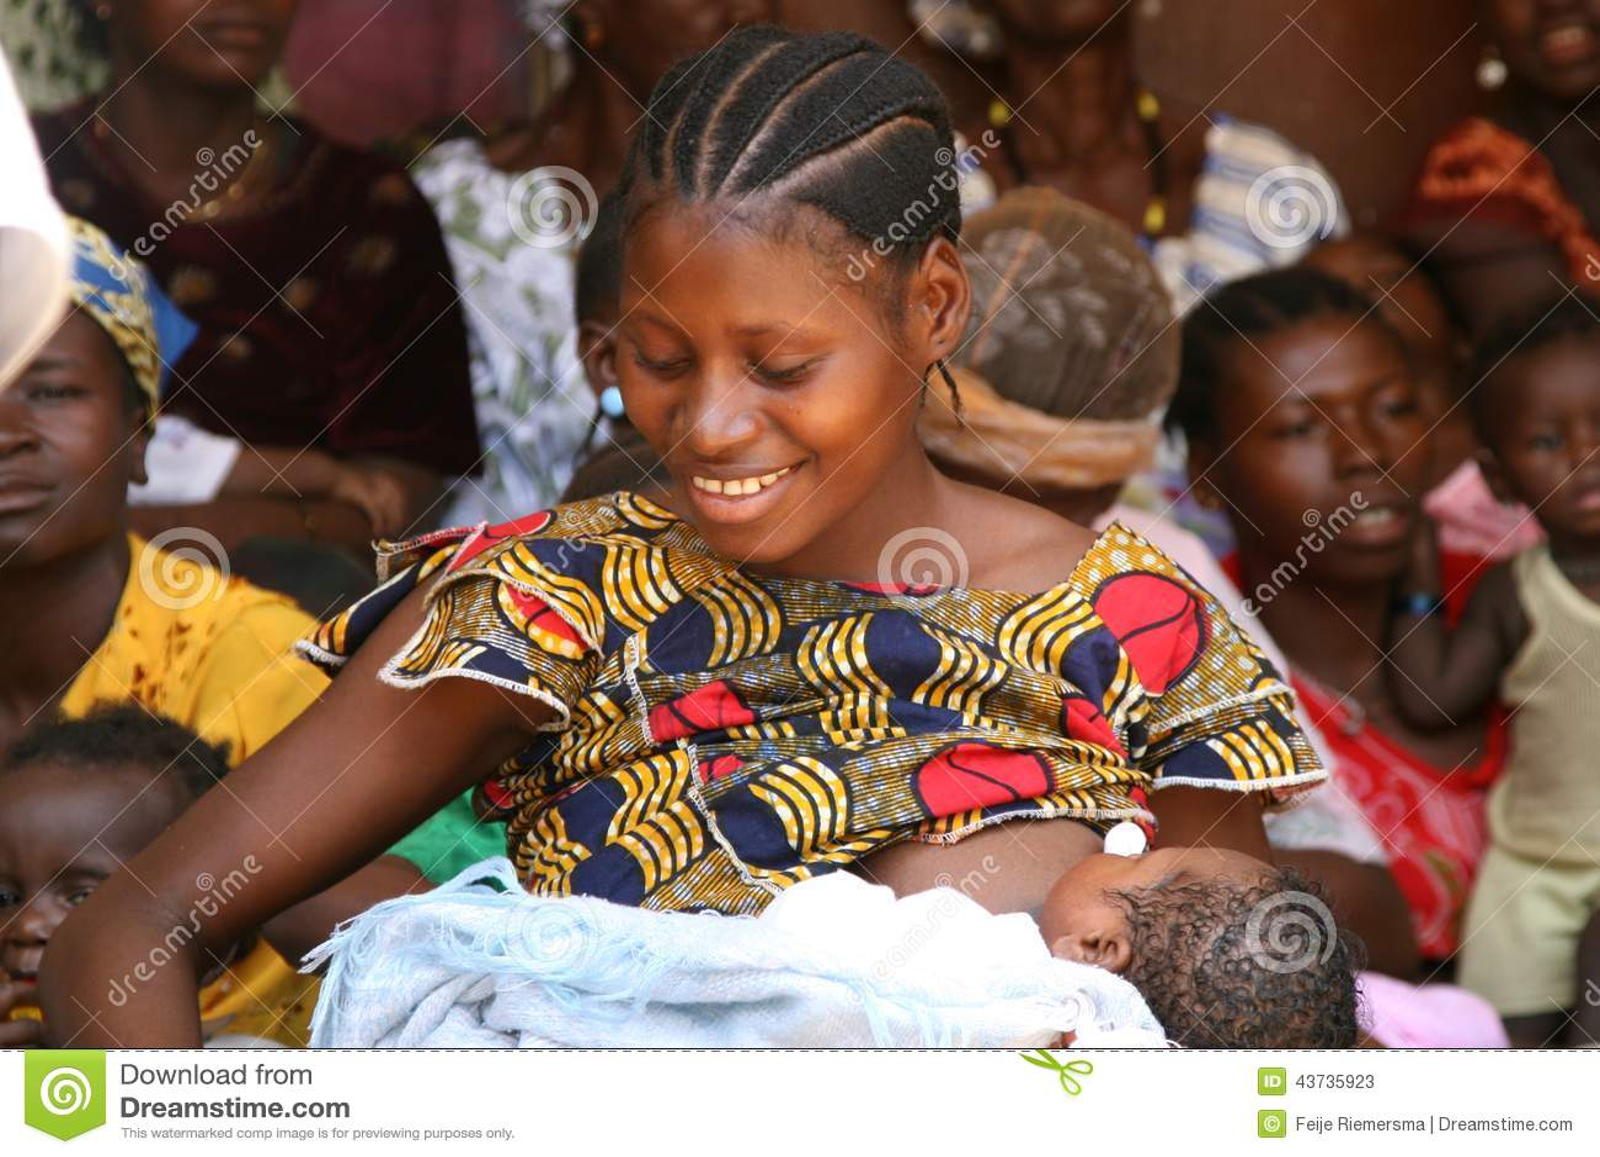 Woman Breastfeeding Her Baby Editorial Stock Photo - Image ...